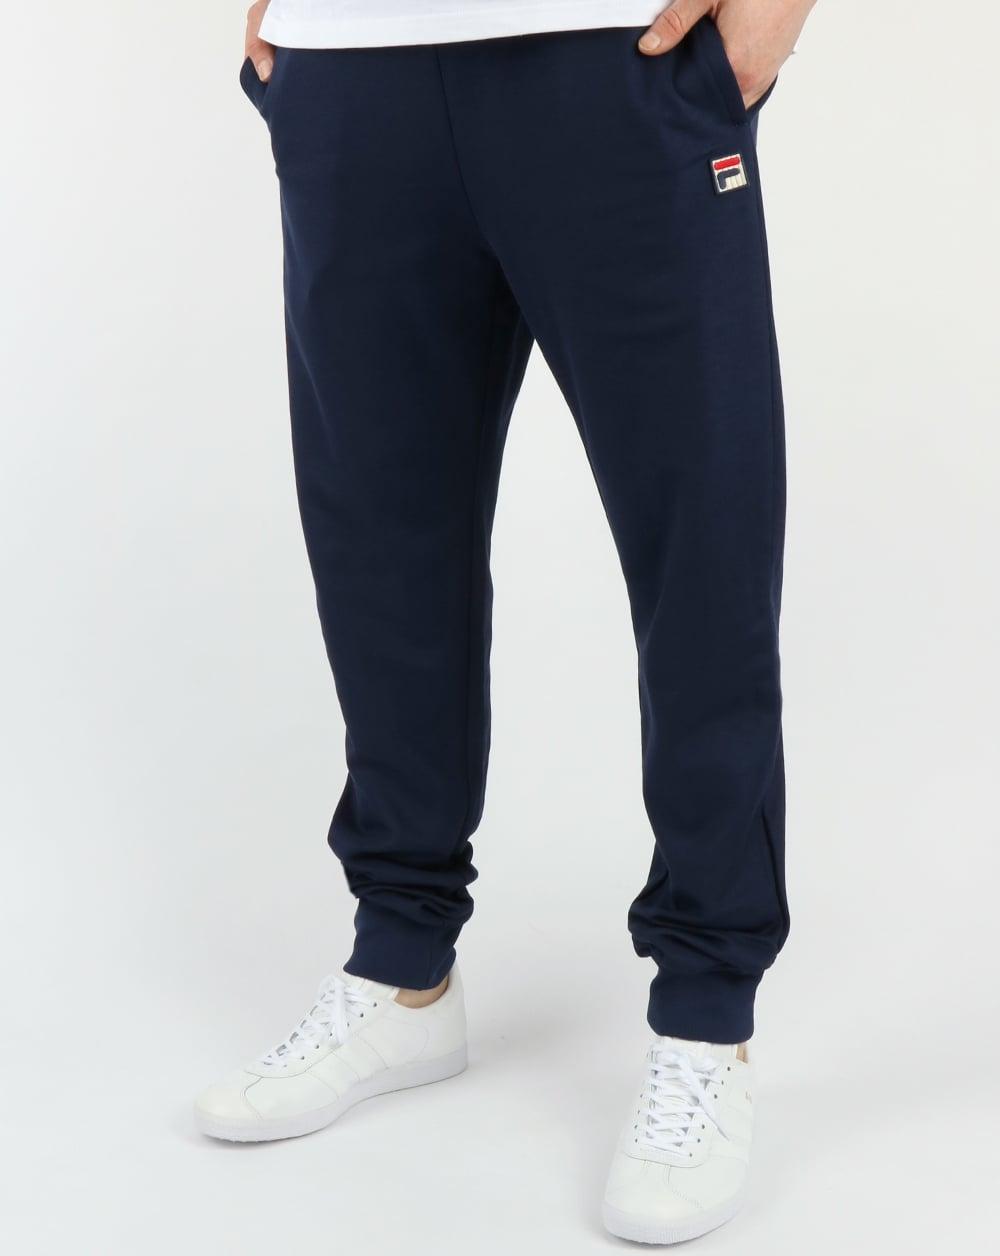 125d23e9ece97 Fila Vintage Naso Track Pants Navy,blue,tracksuit,bottoms,classic,mens